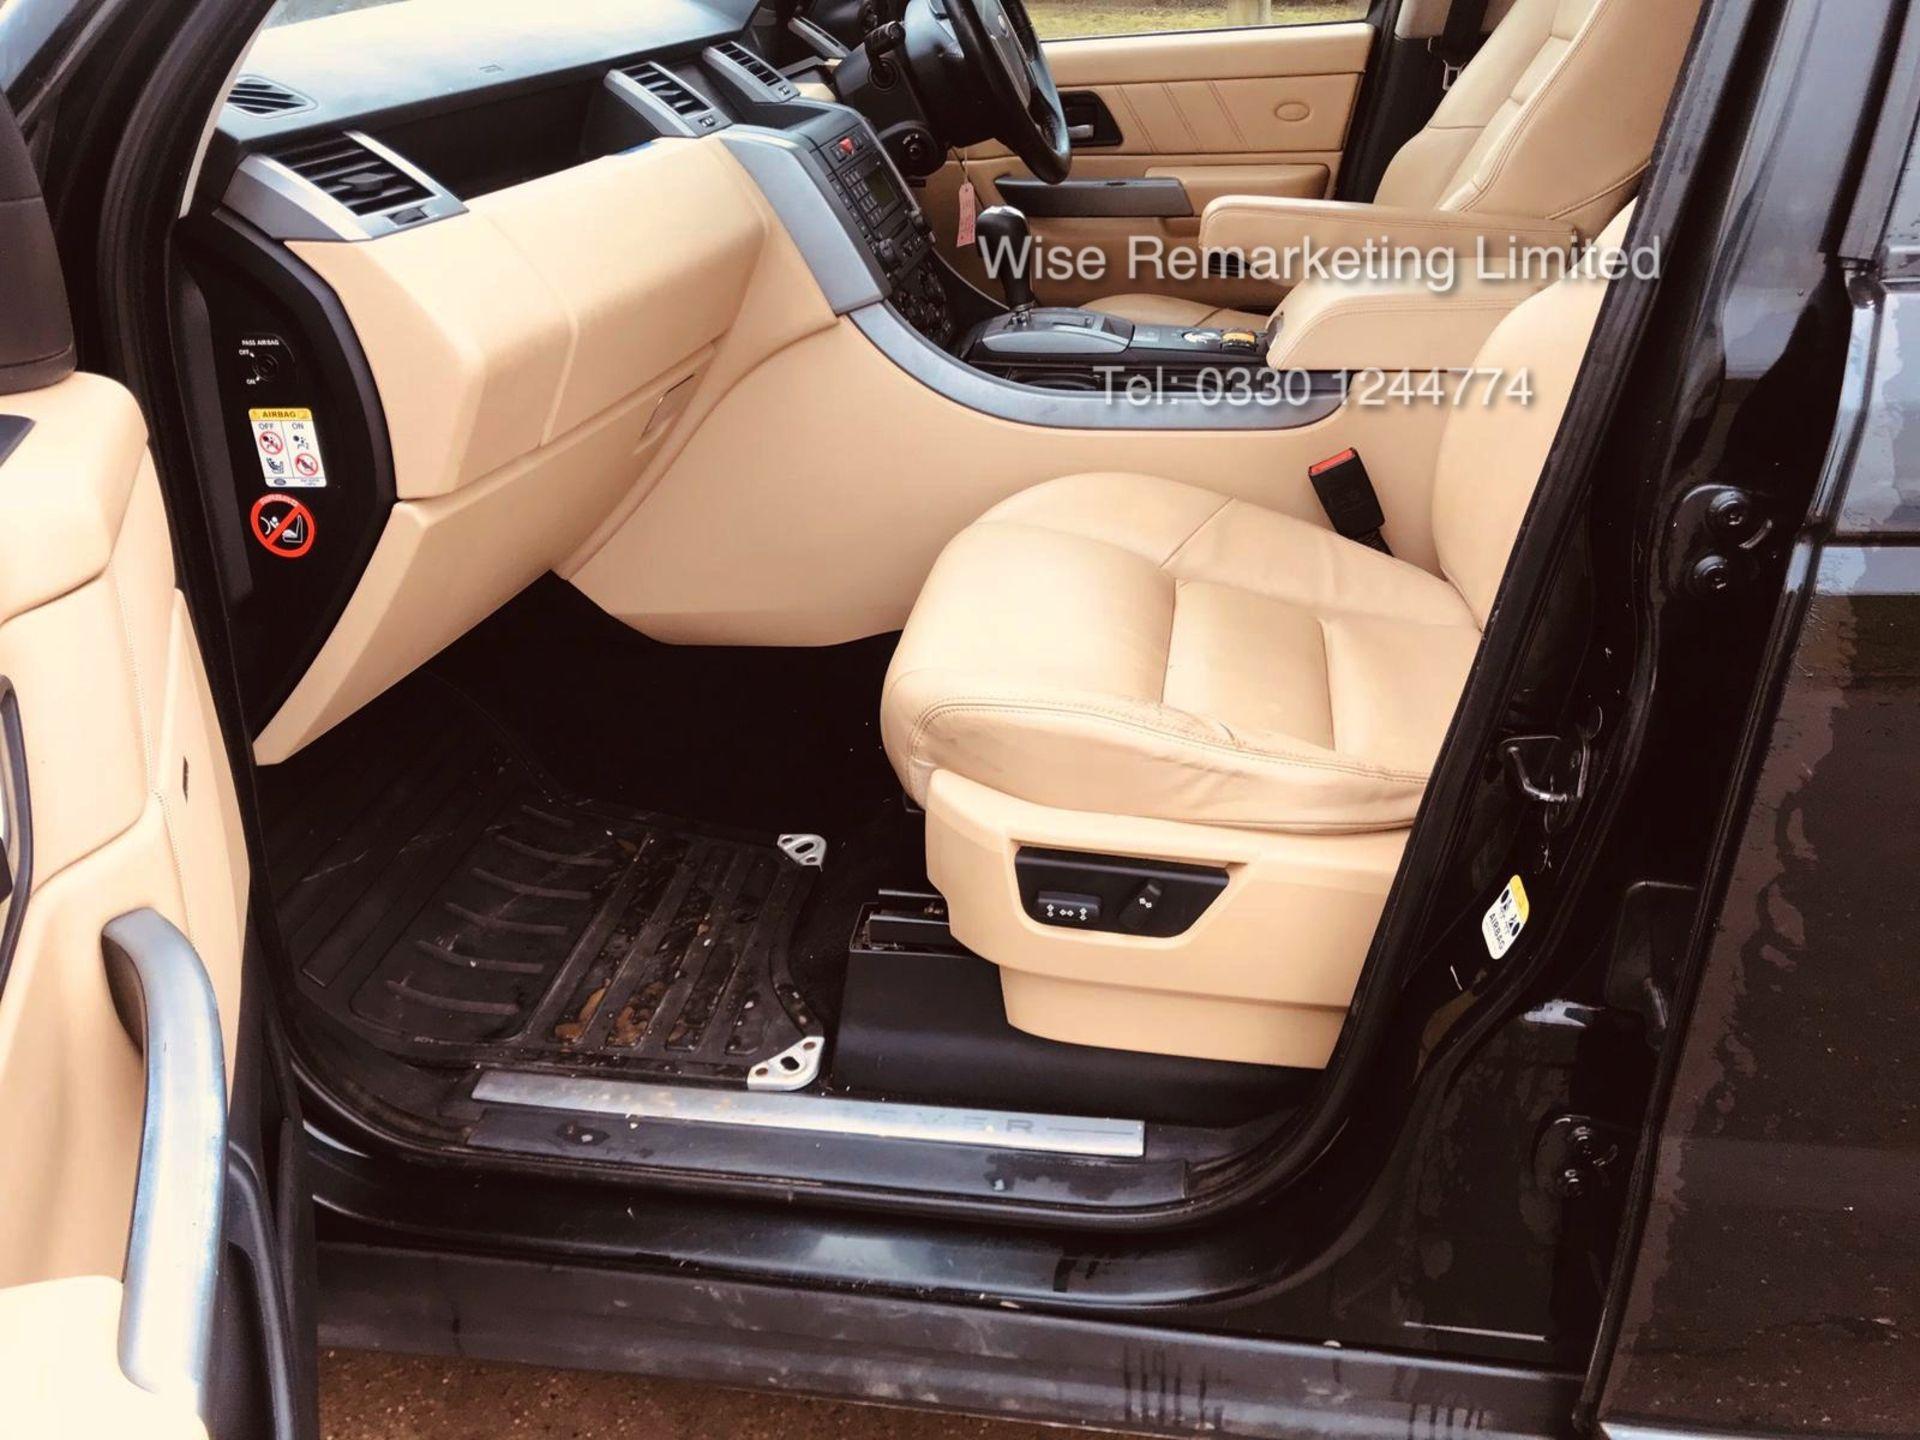 Range Rover Sport 2.7 TDV6 HSE Auto - 2008 Model - Cream Leather - Sat Nav - Heated Seats - Image 8 of 19